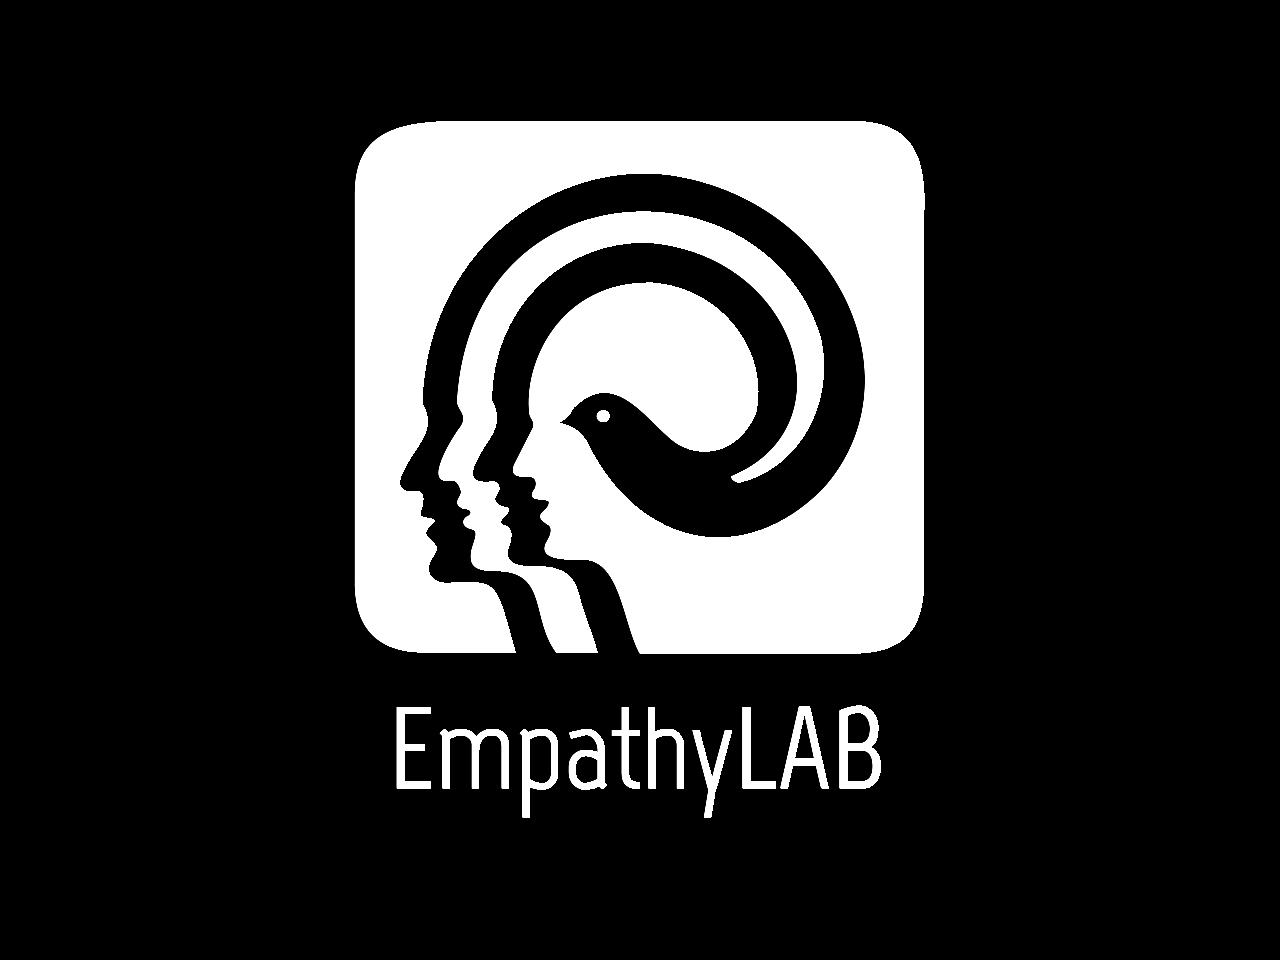 EmpathyLAB